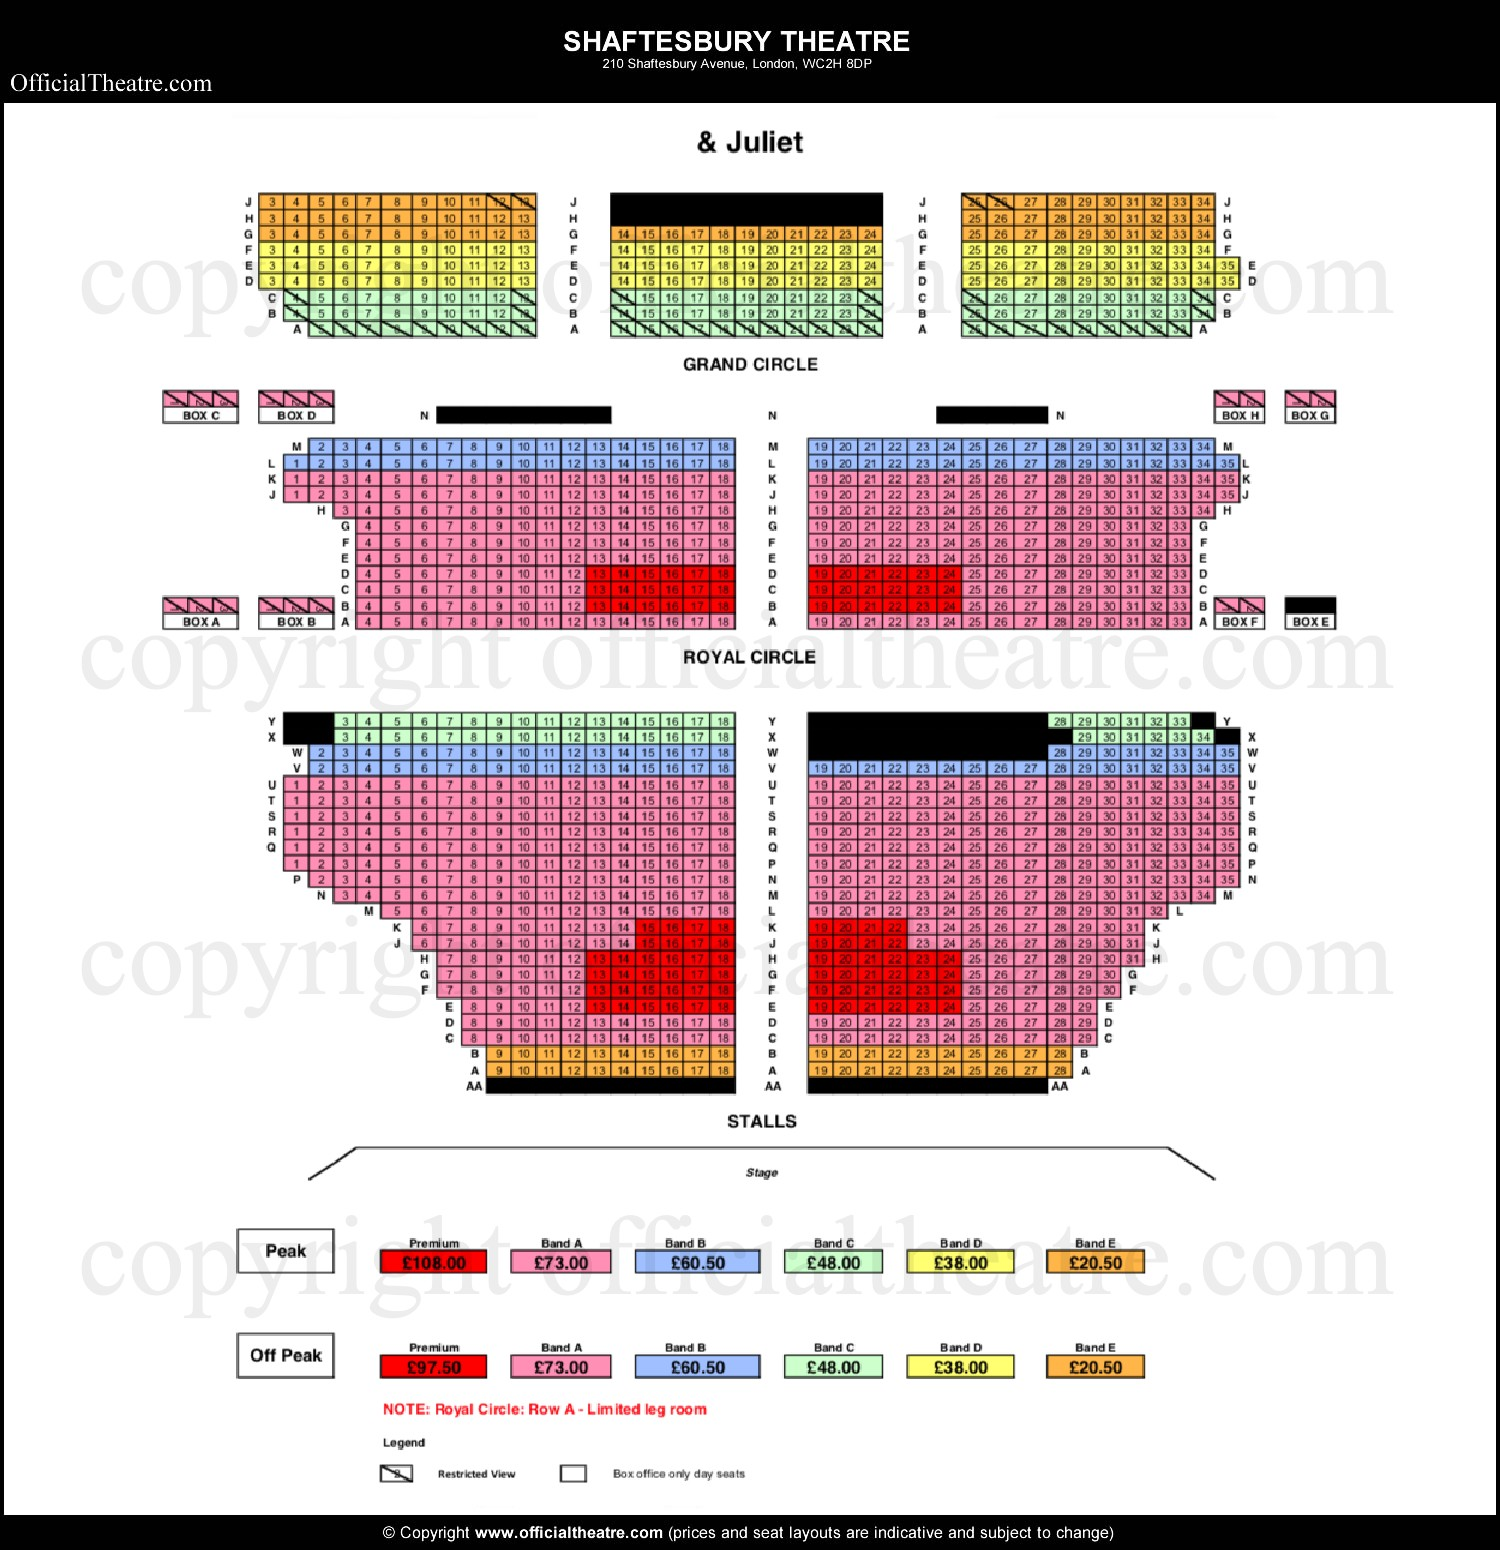 Shaftesbury Theatre seating plan